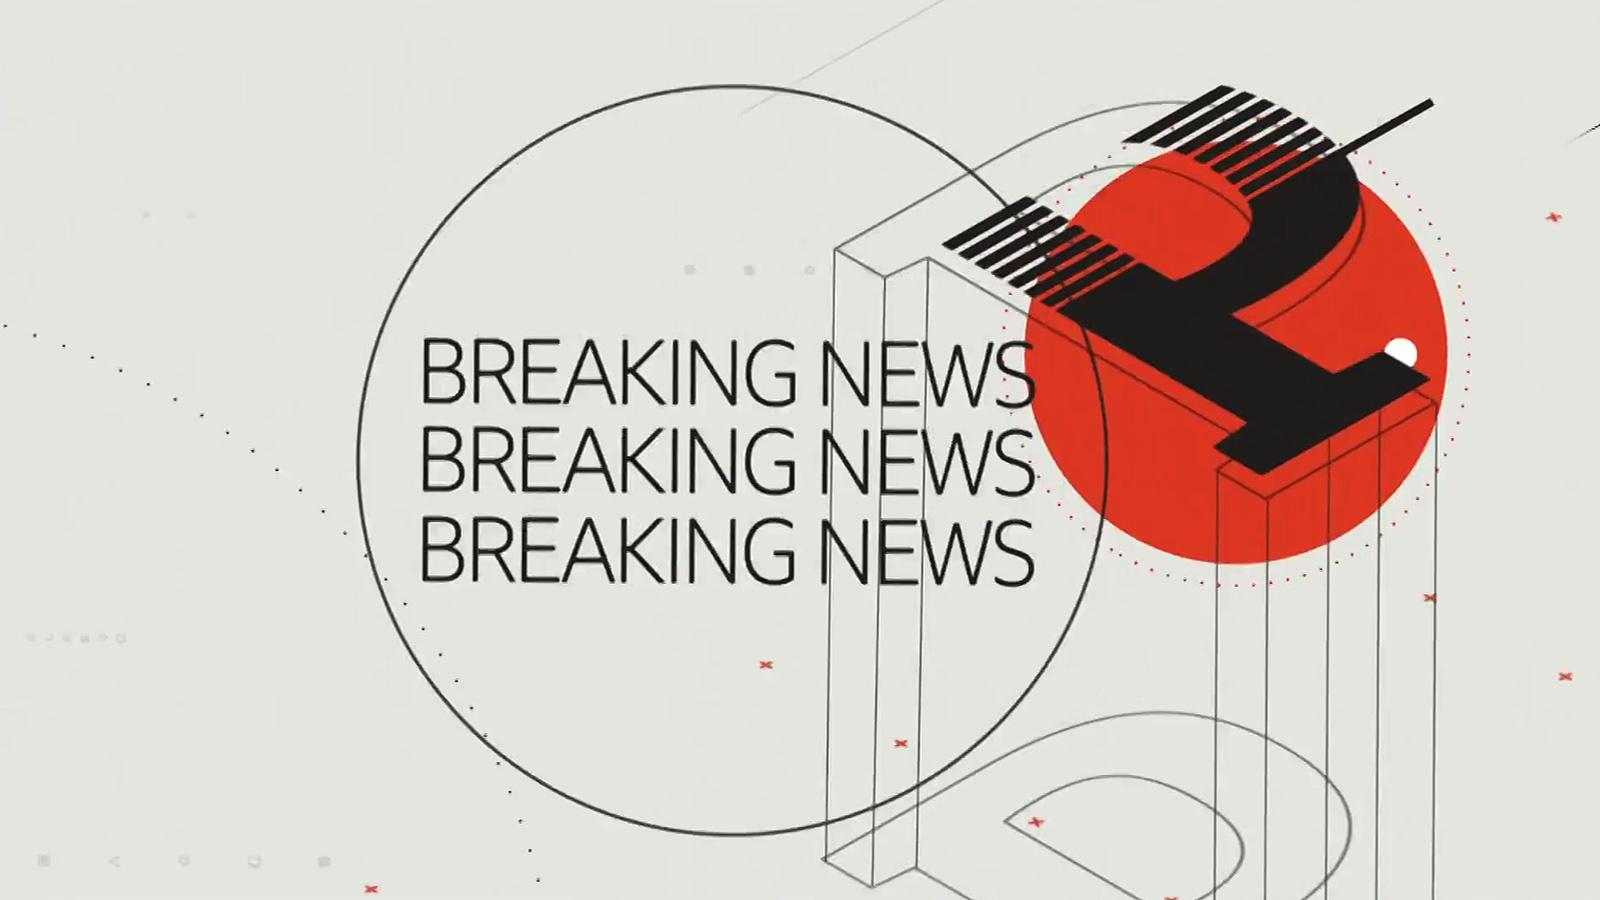 NCS_BBC-World-News_Impact_005